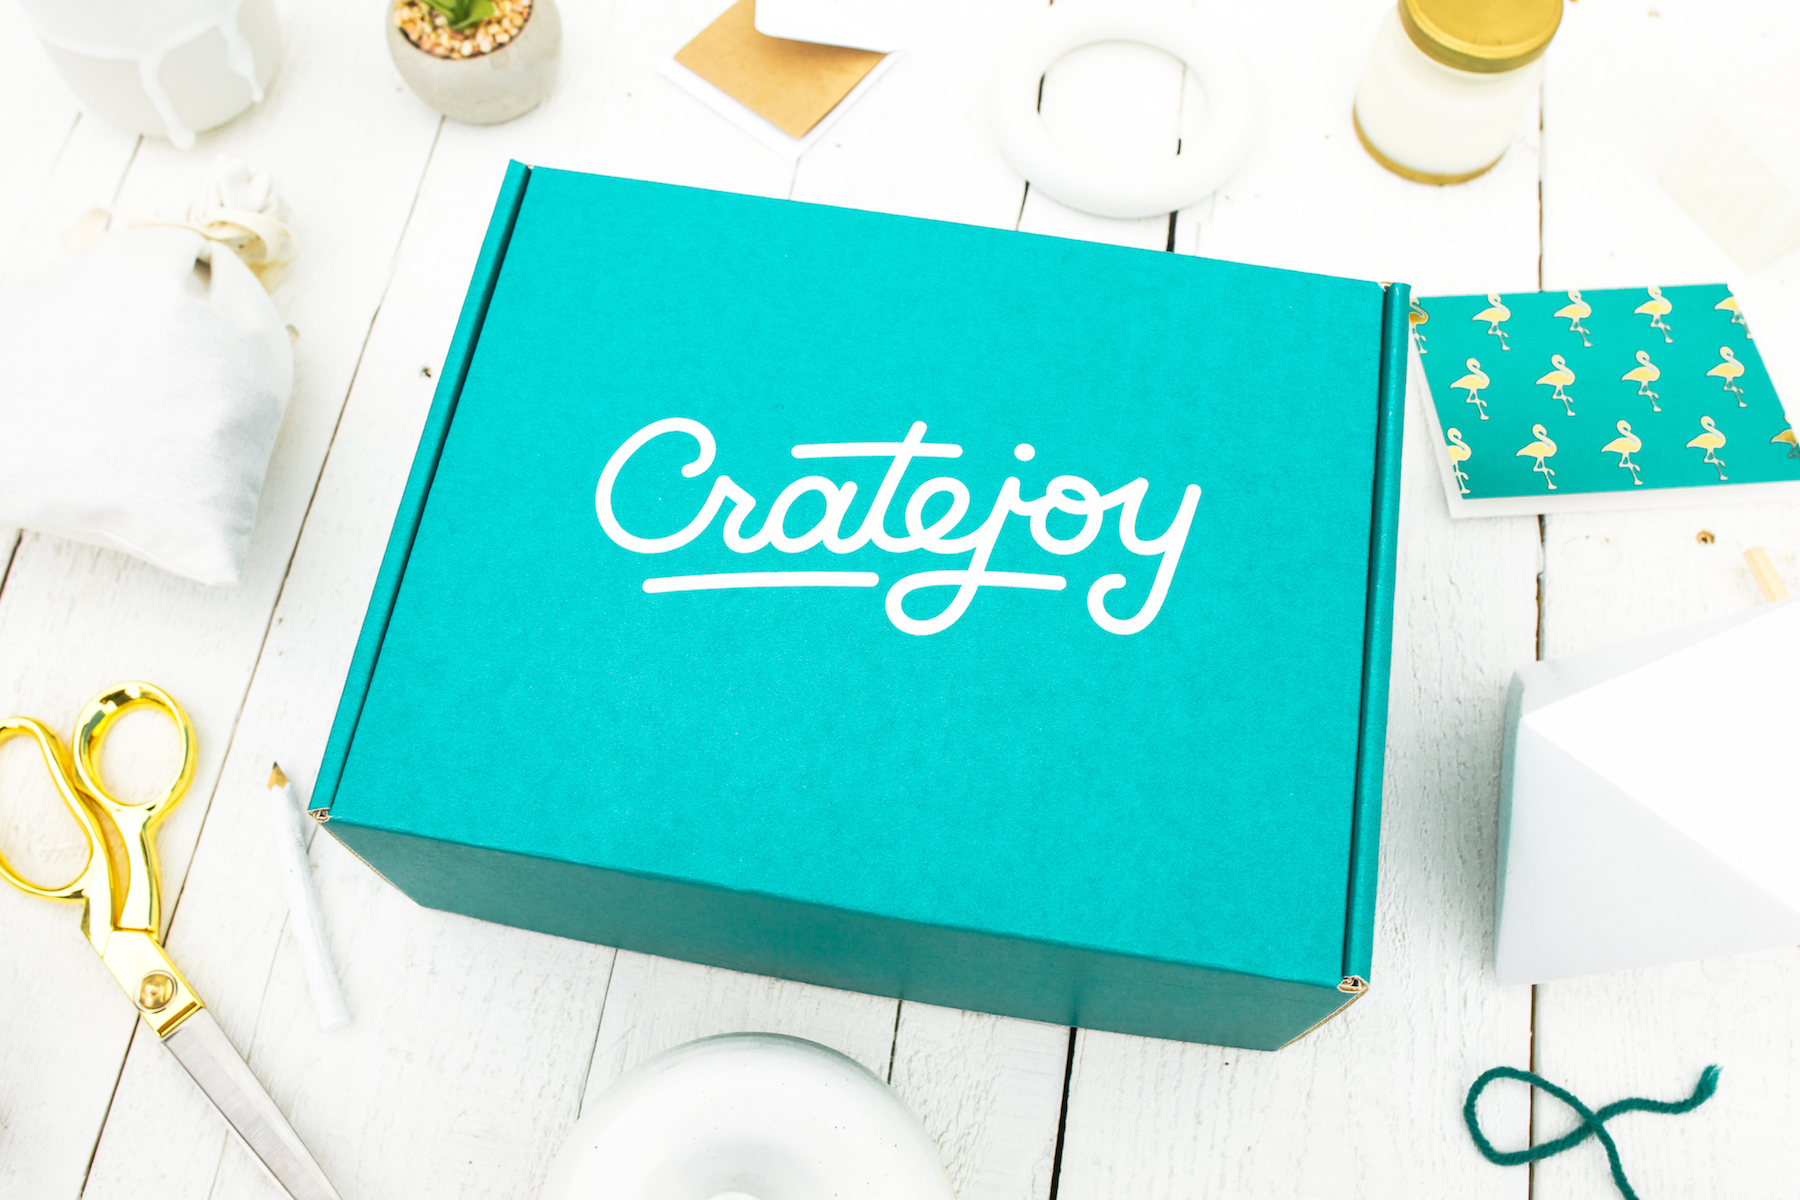 Chelsea-Francis-Product-Photographer-Crate-Joy-1.jpg